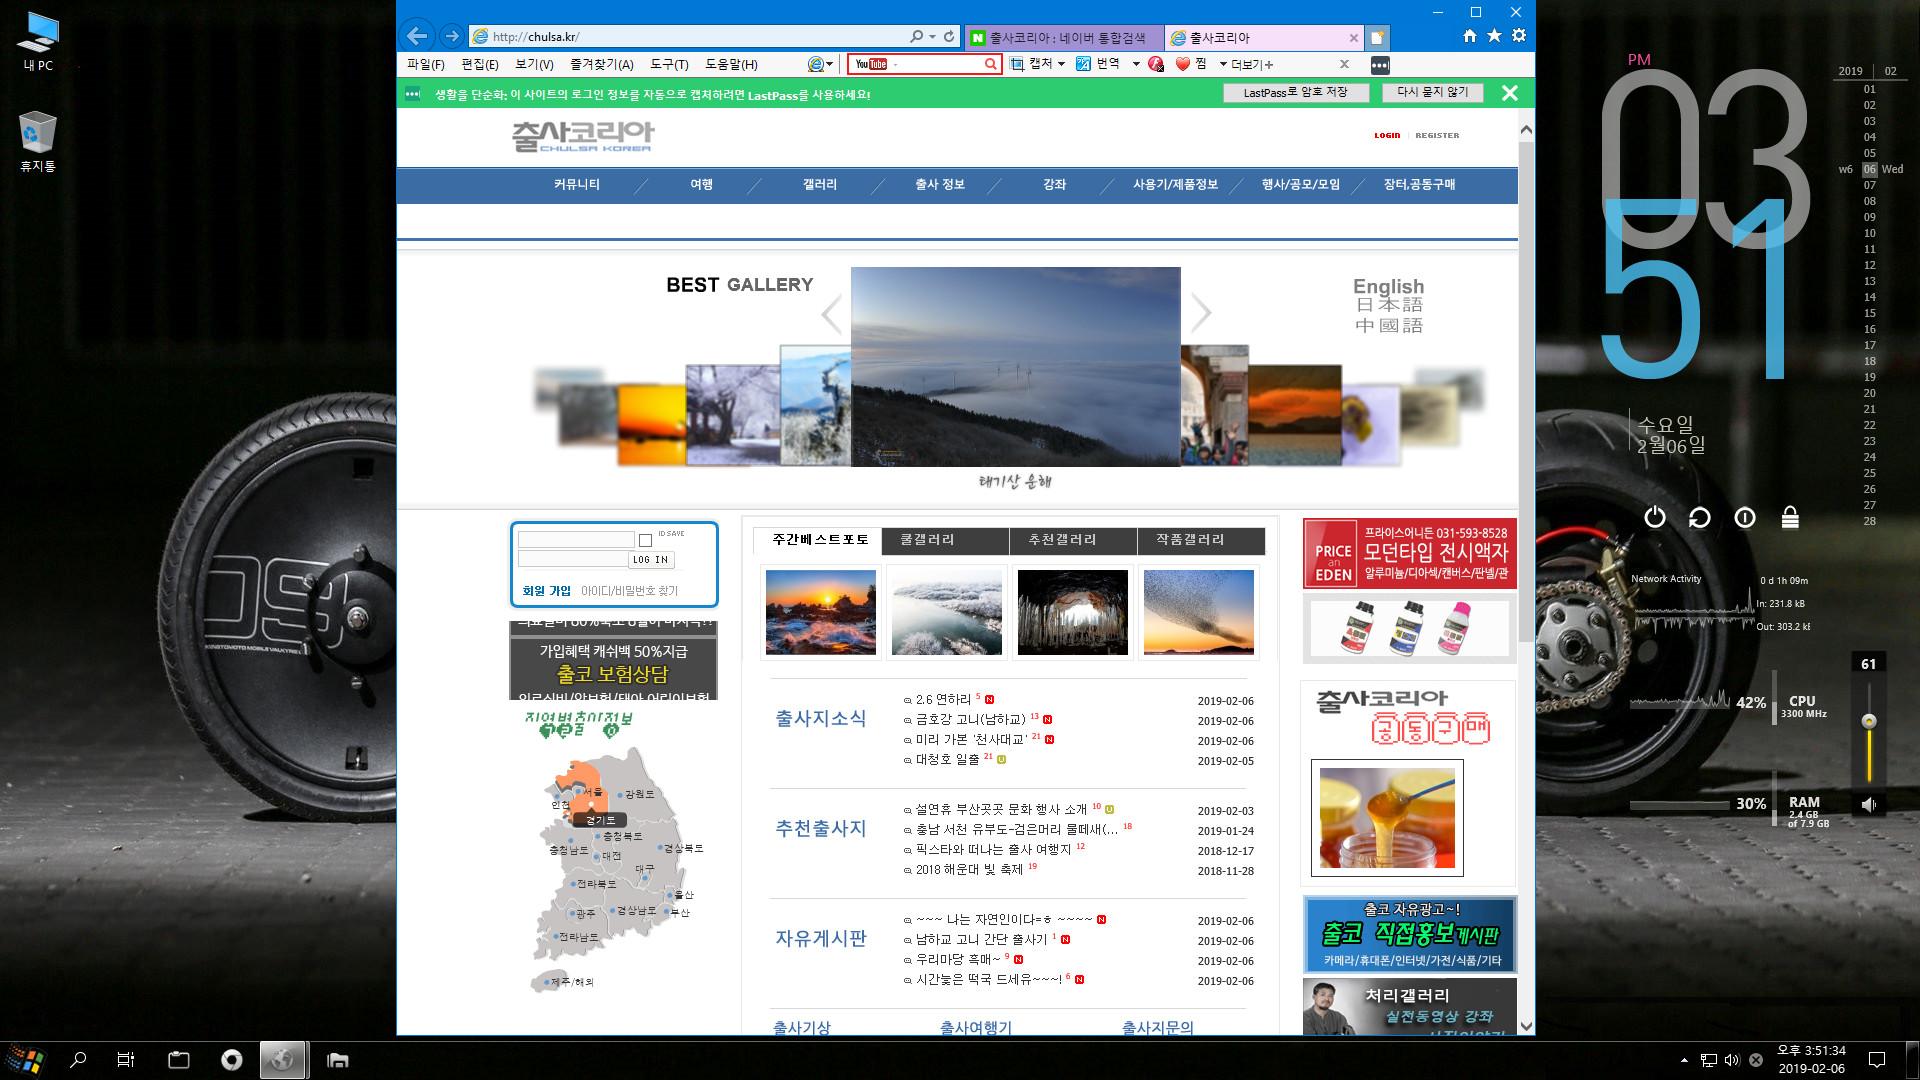 Workstations ST51_0014-02.jpg